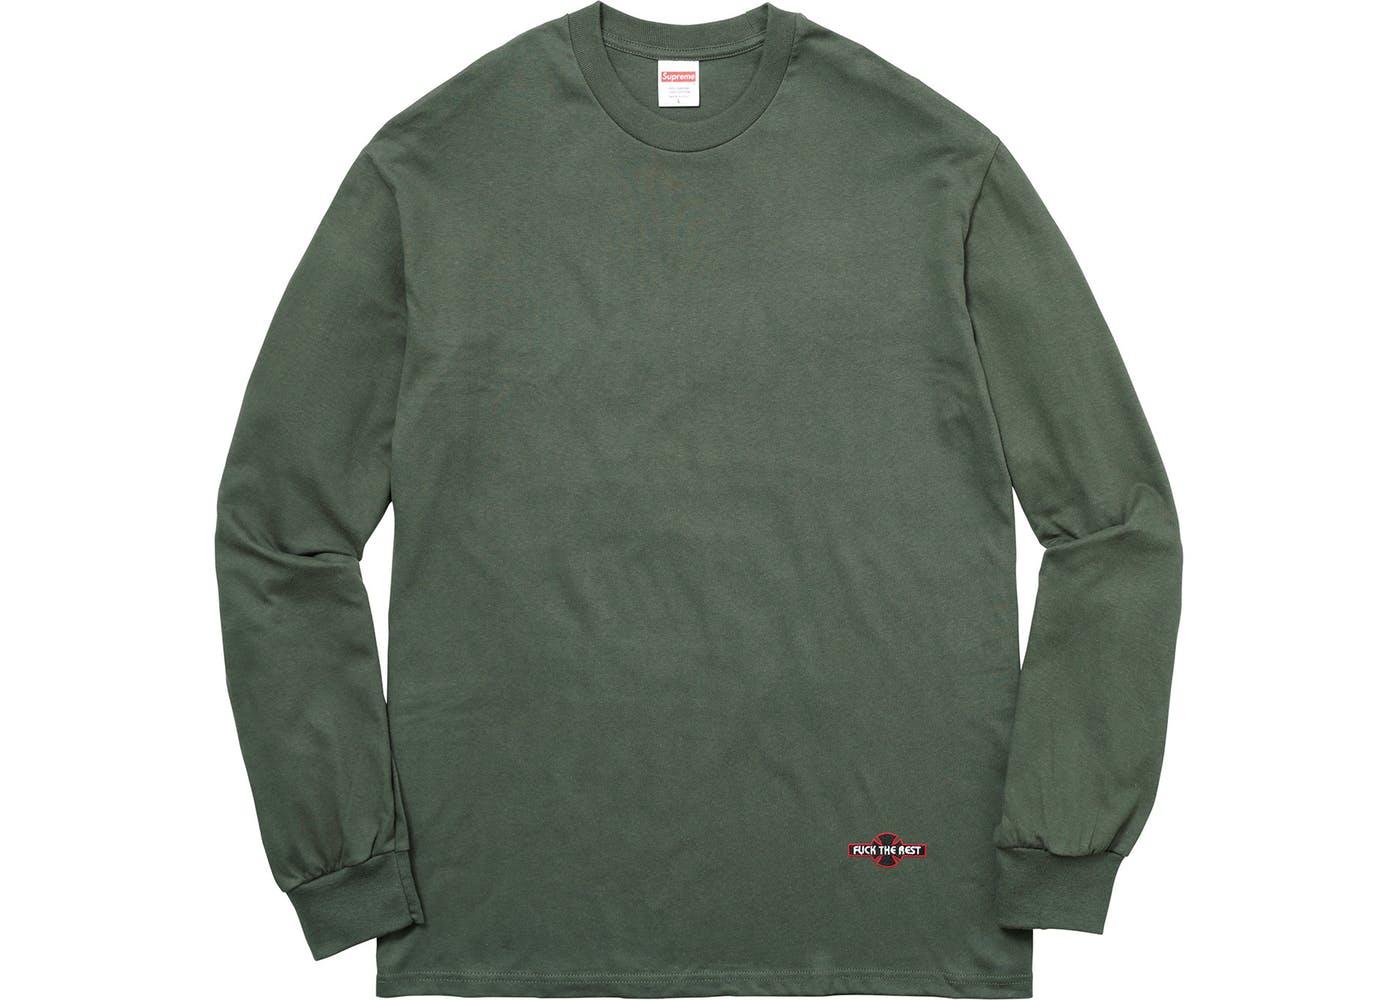 balenciaga t shirt olive